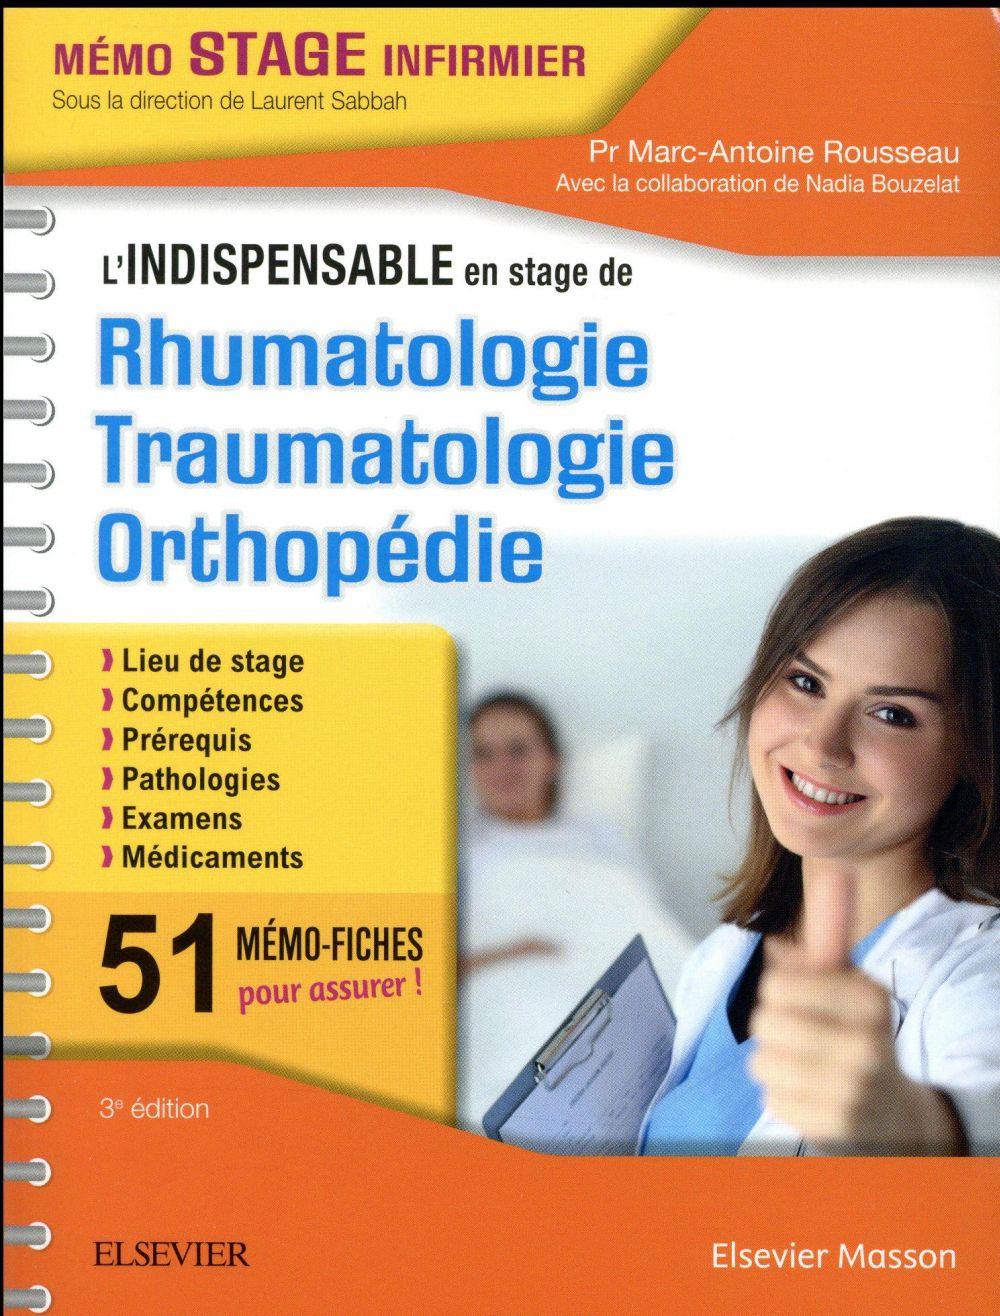 L'INDISPENSABLE EN STAGE DE RHUMATOLOGIE, TRAUMATOLOGIE, ORTHOPEDIE Rousseau Marc-Antoine Elsevier Masson